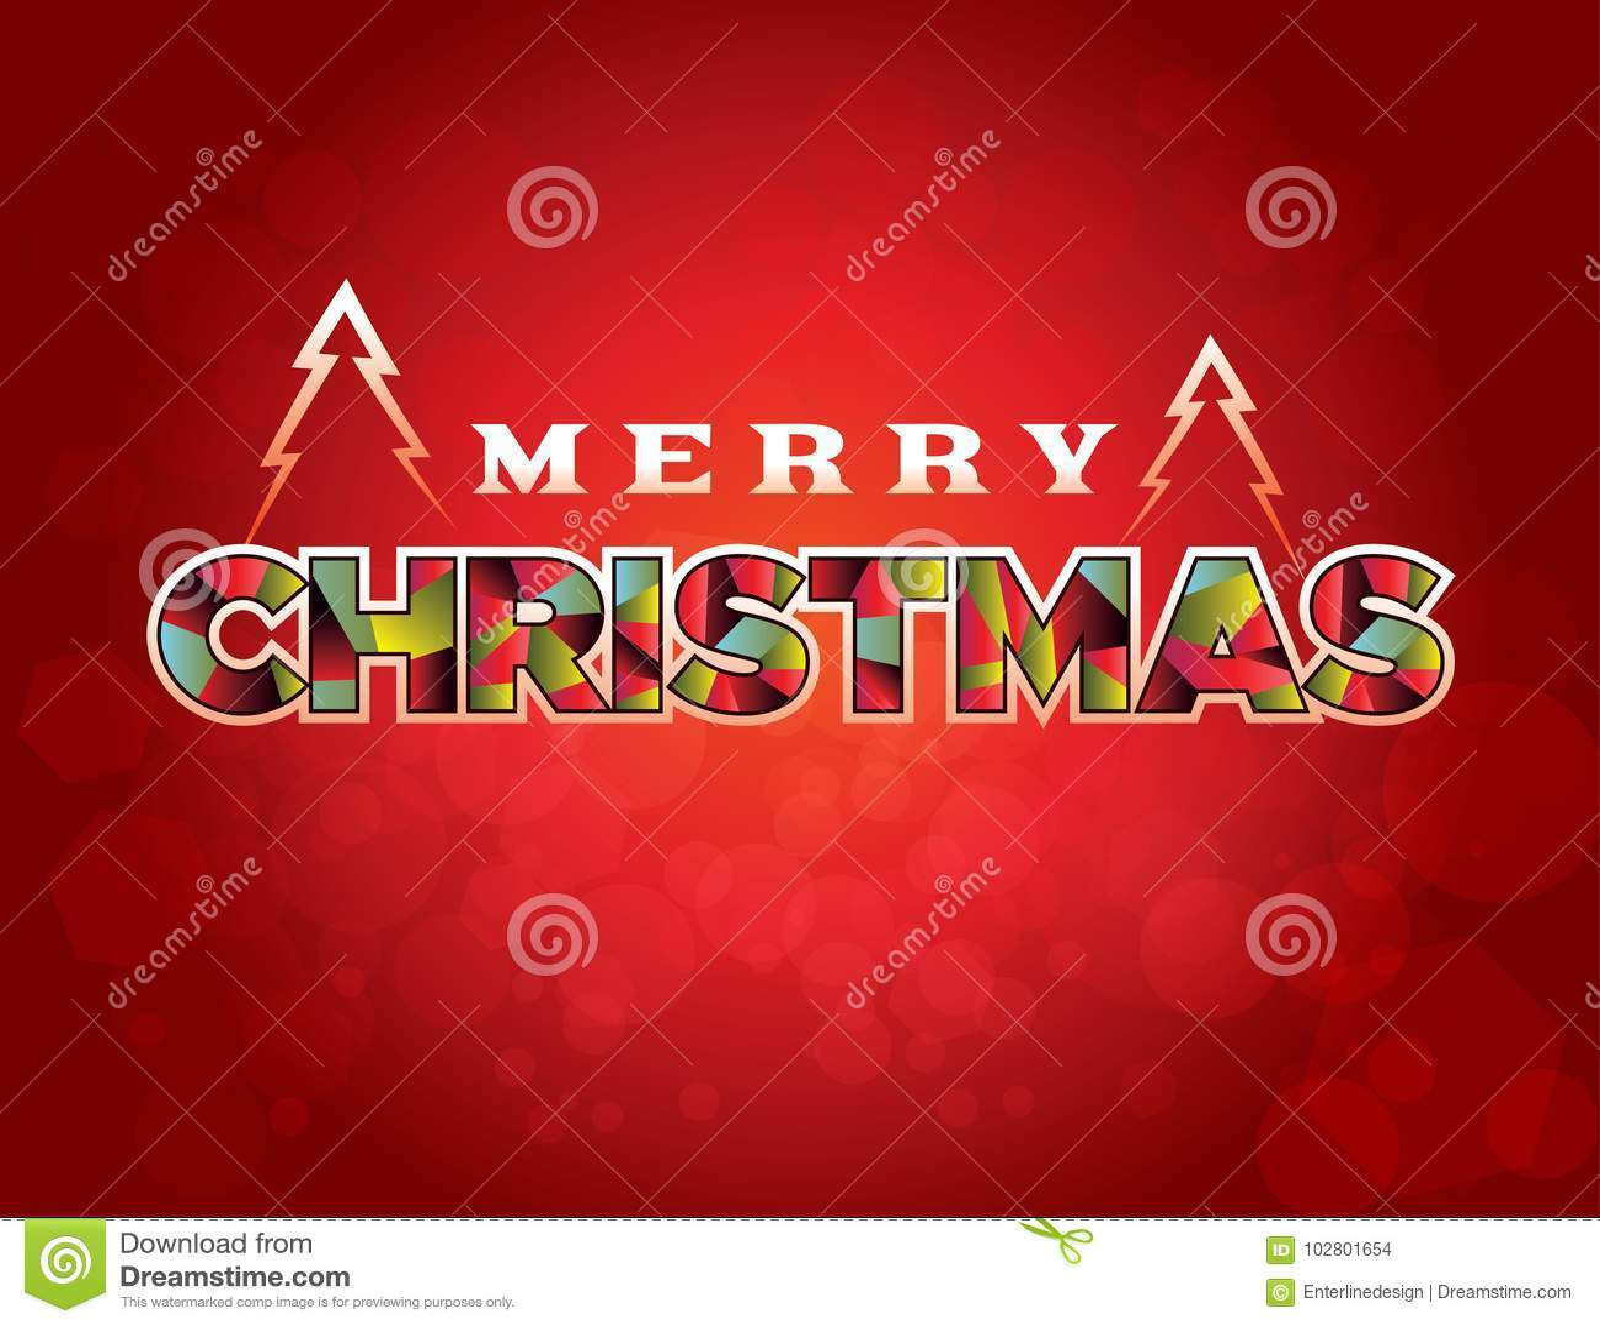 Merry christmas greeting message illustration stock vector merry christmas greeting message illustration m4hsunfo